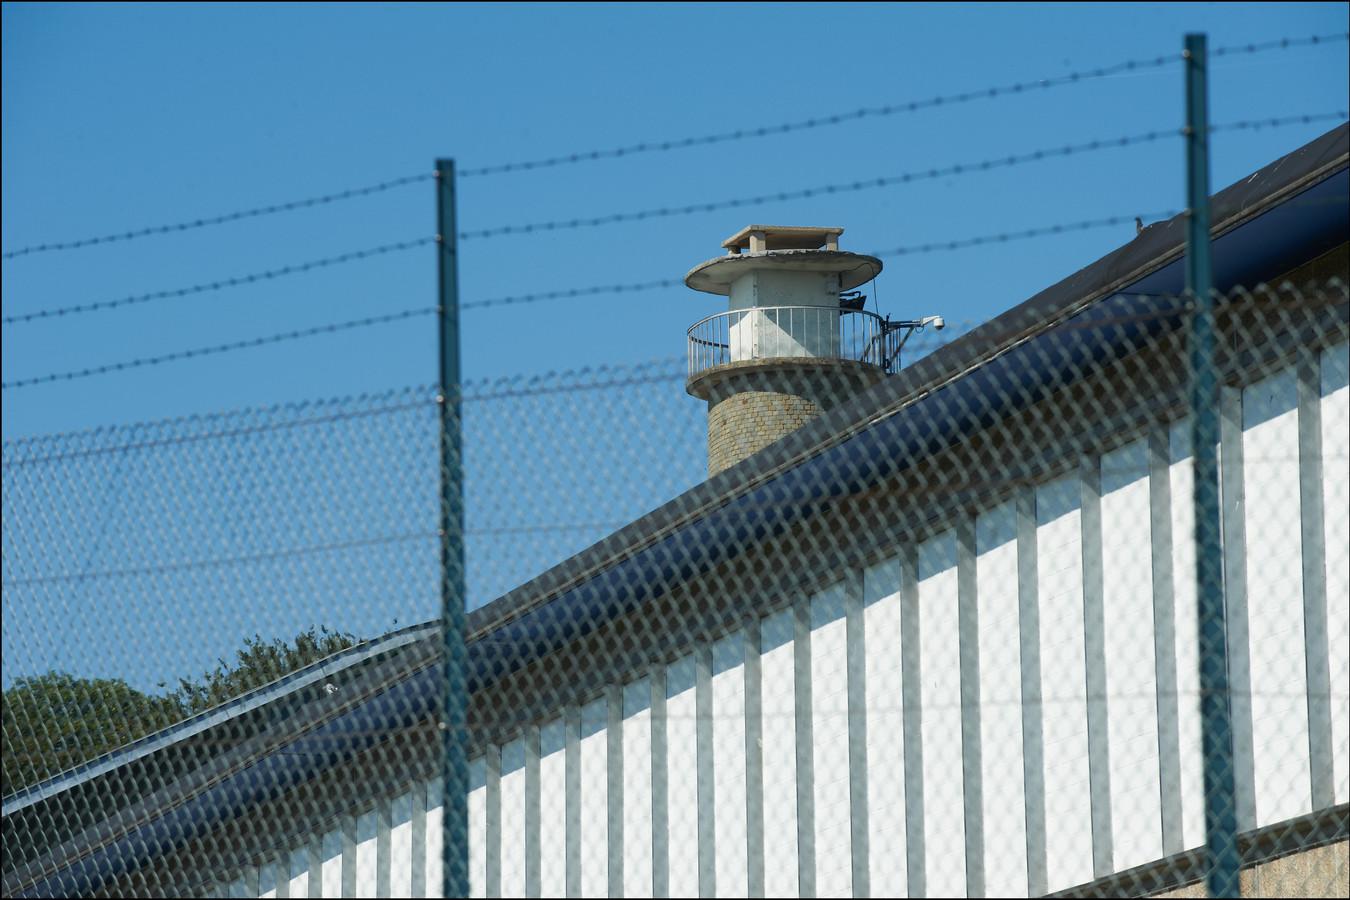 Prison de Jamioulx